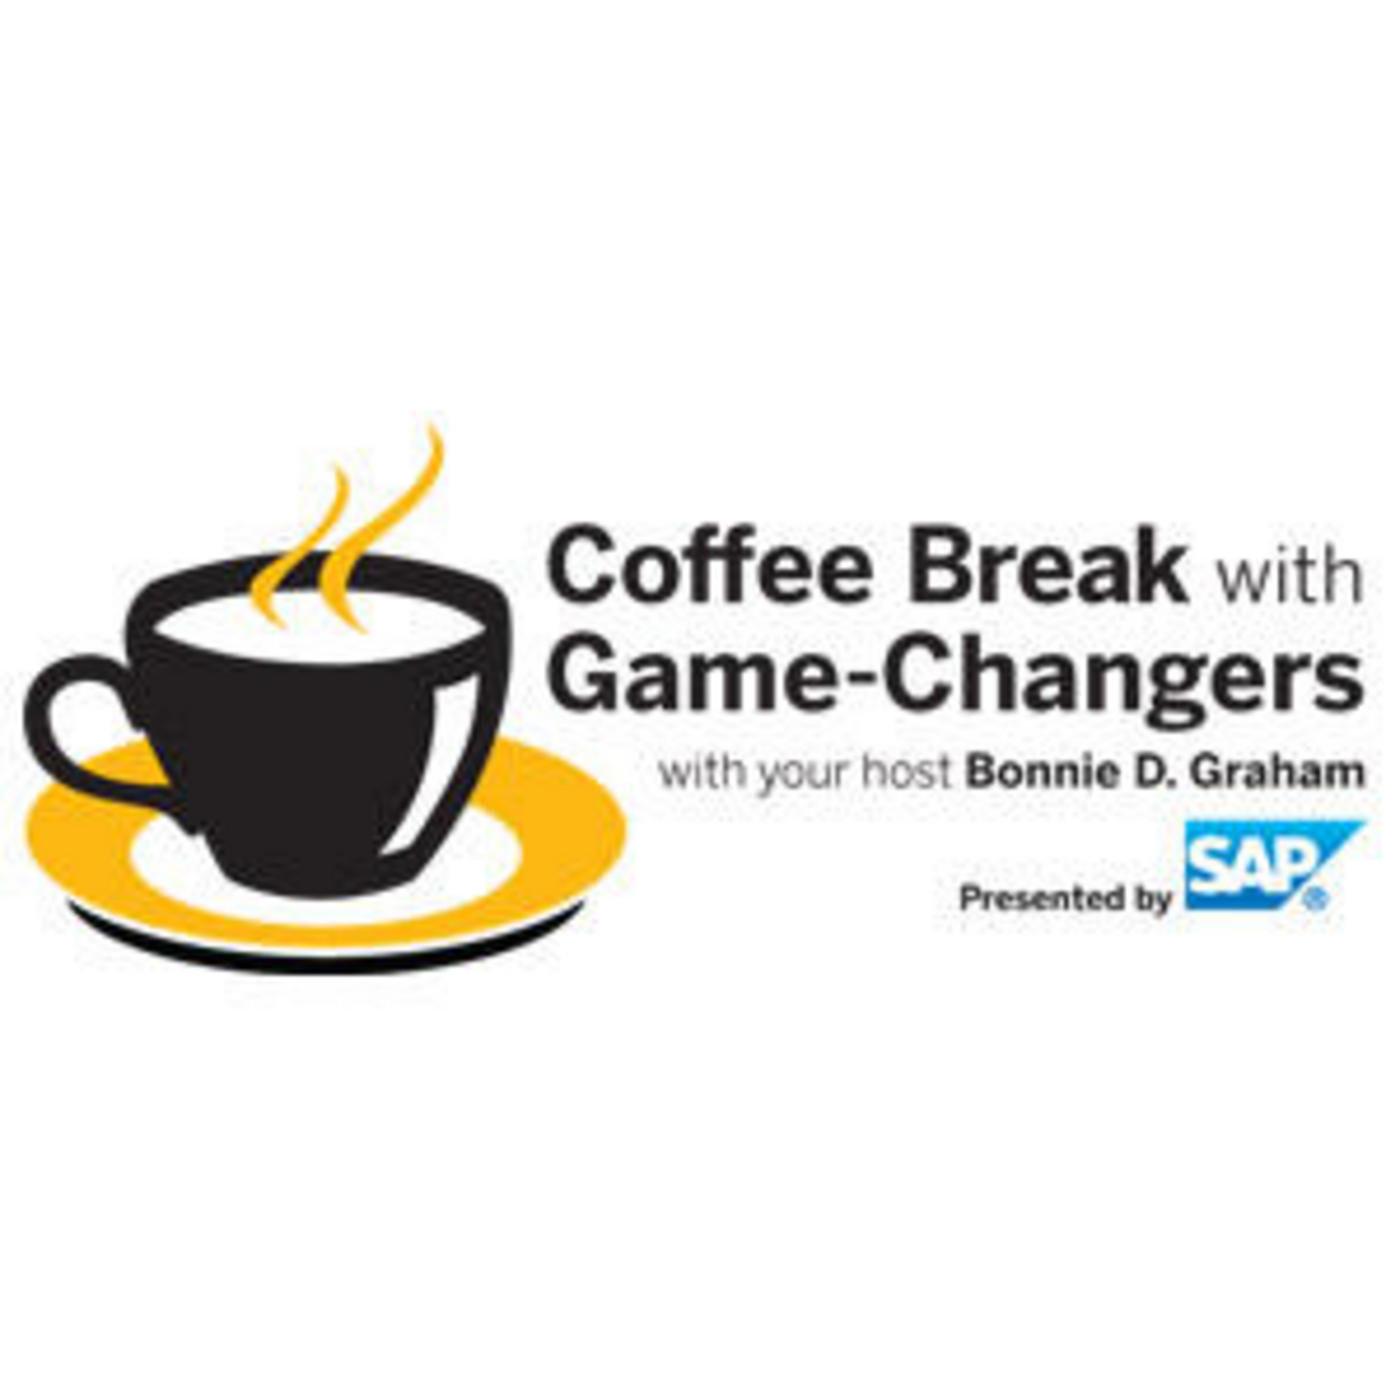 retail in 5 years digital dinosaurs vs survivors part 2 en coffee break with game changers. Black Bedroom Furniture Sets. Home Design Ideas